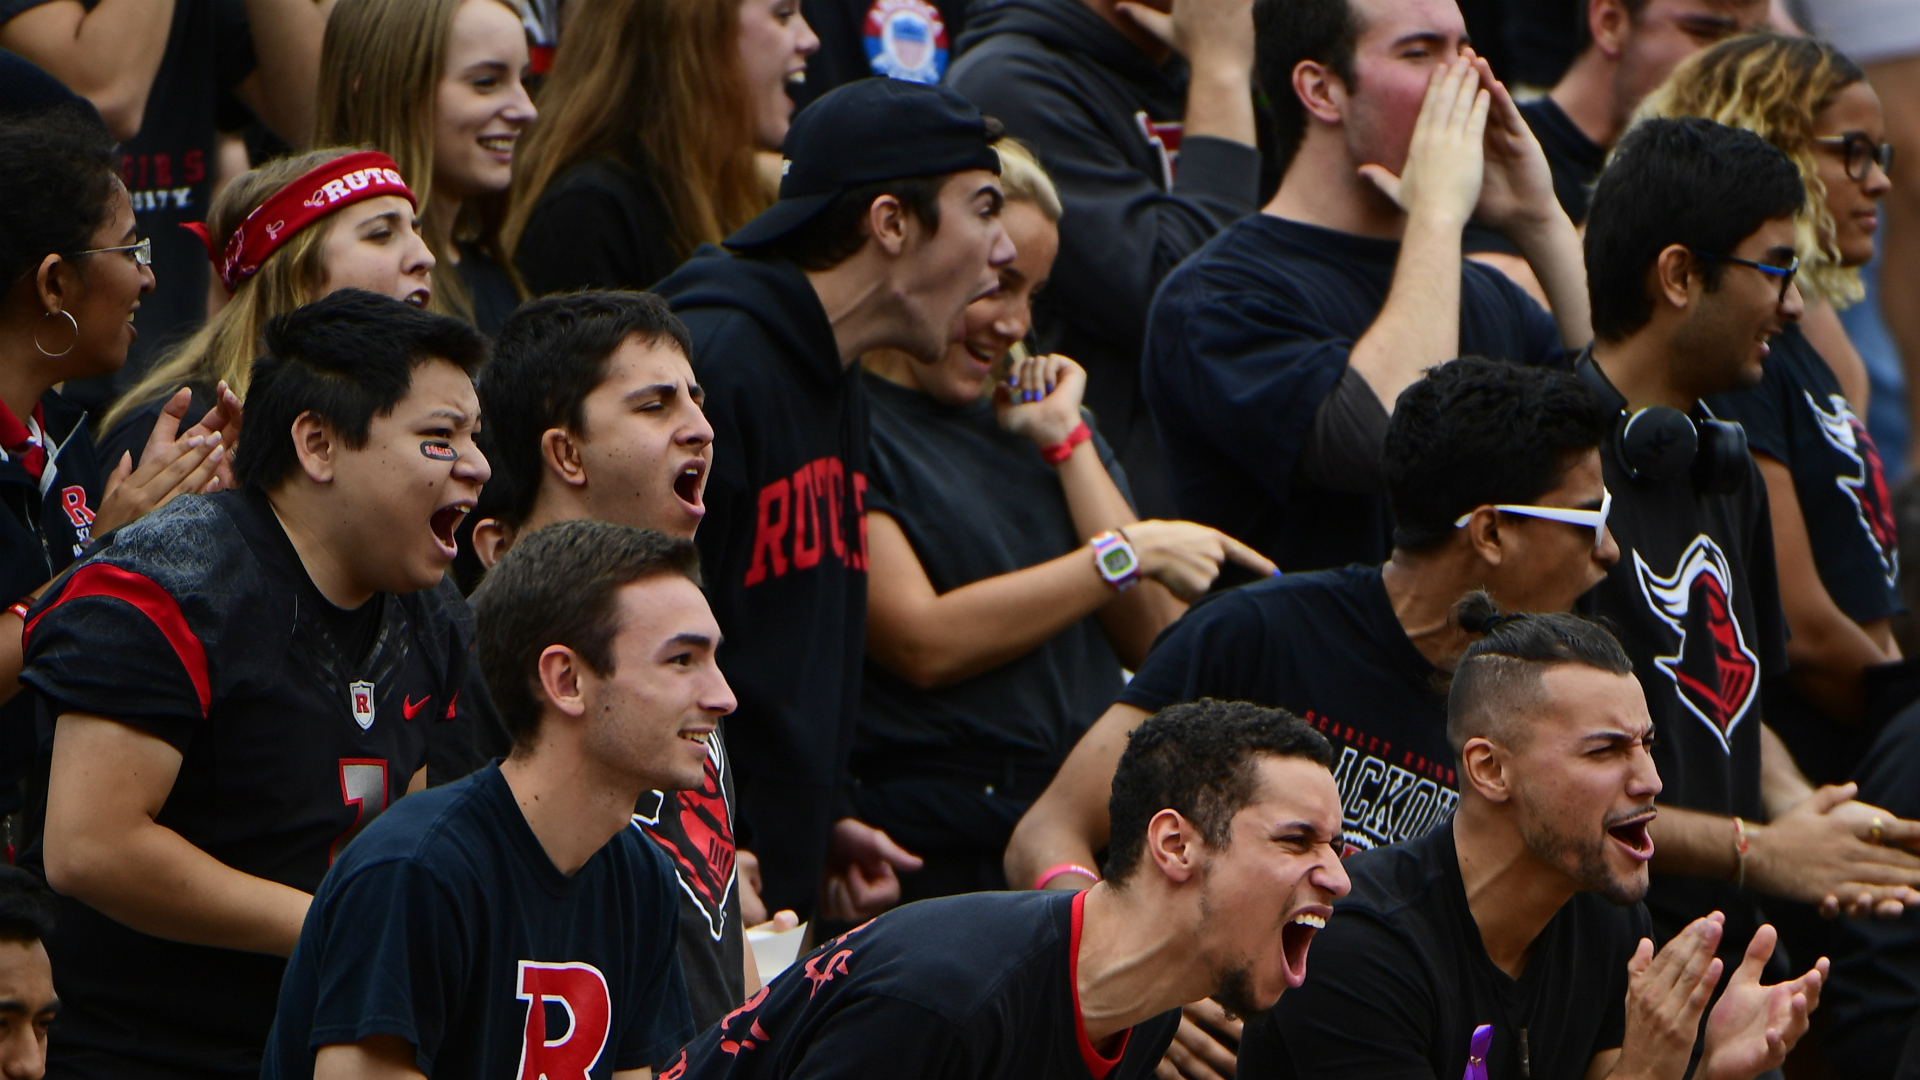 Rutgers-fans-081318-getty-ftr_1e1xwspkkvyjy1vs12c4zr94f5